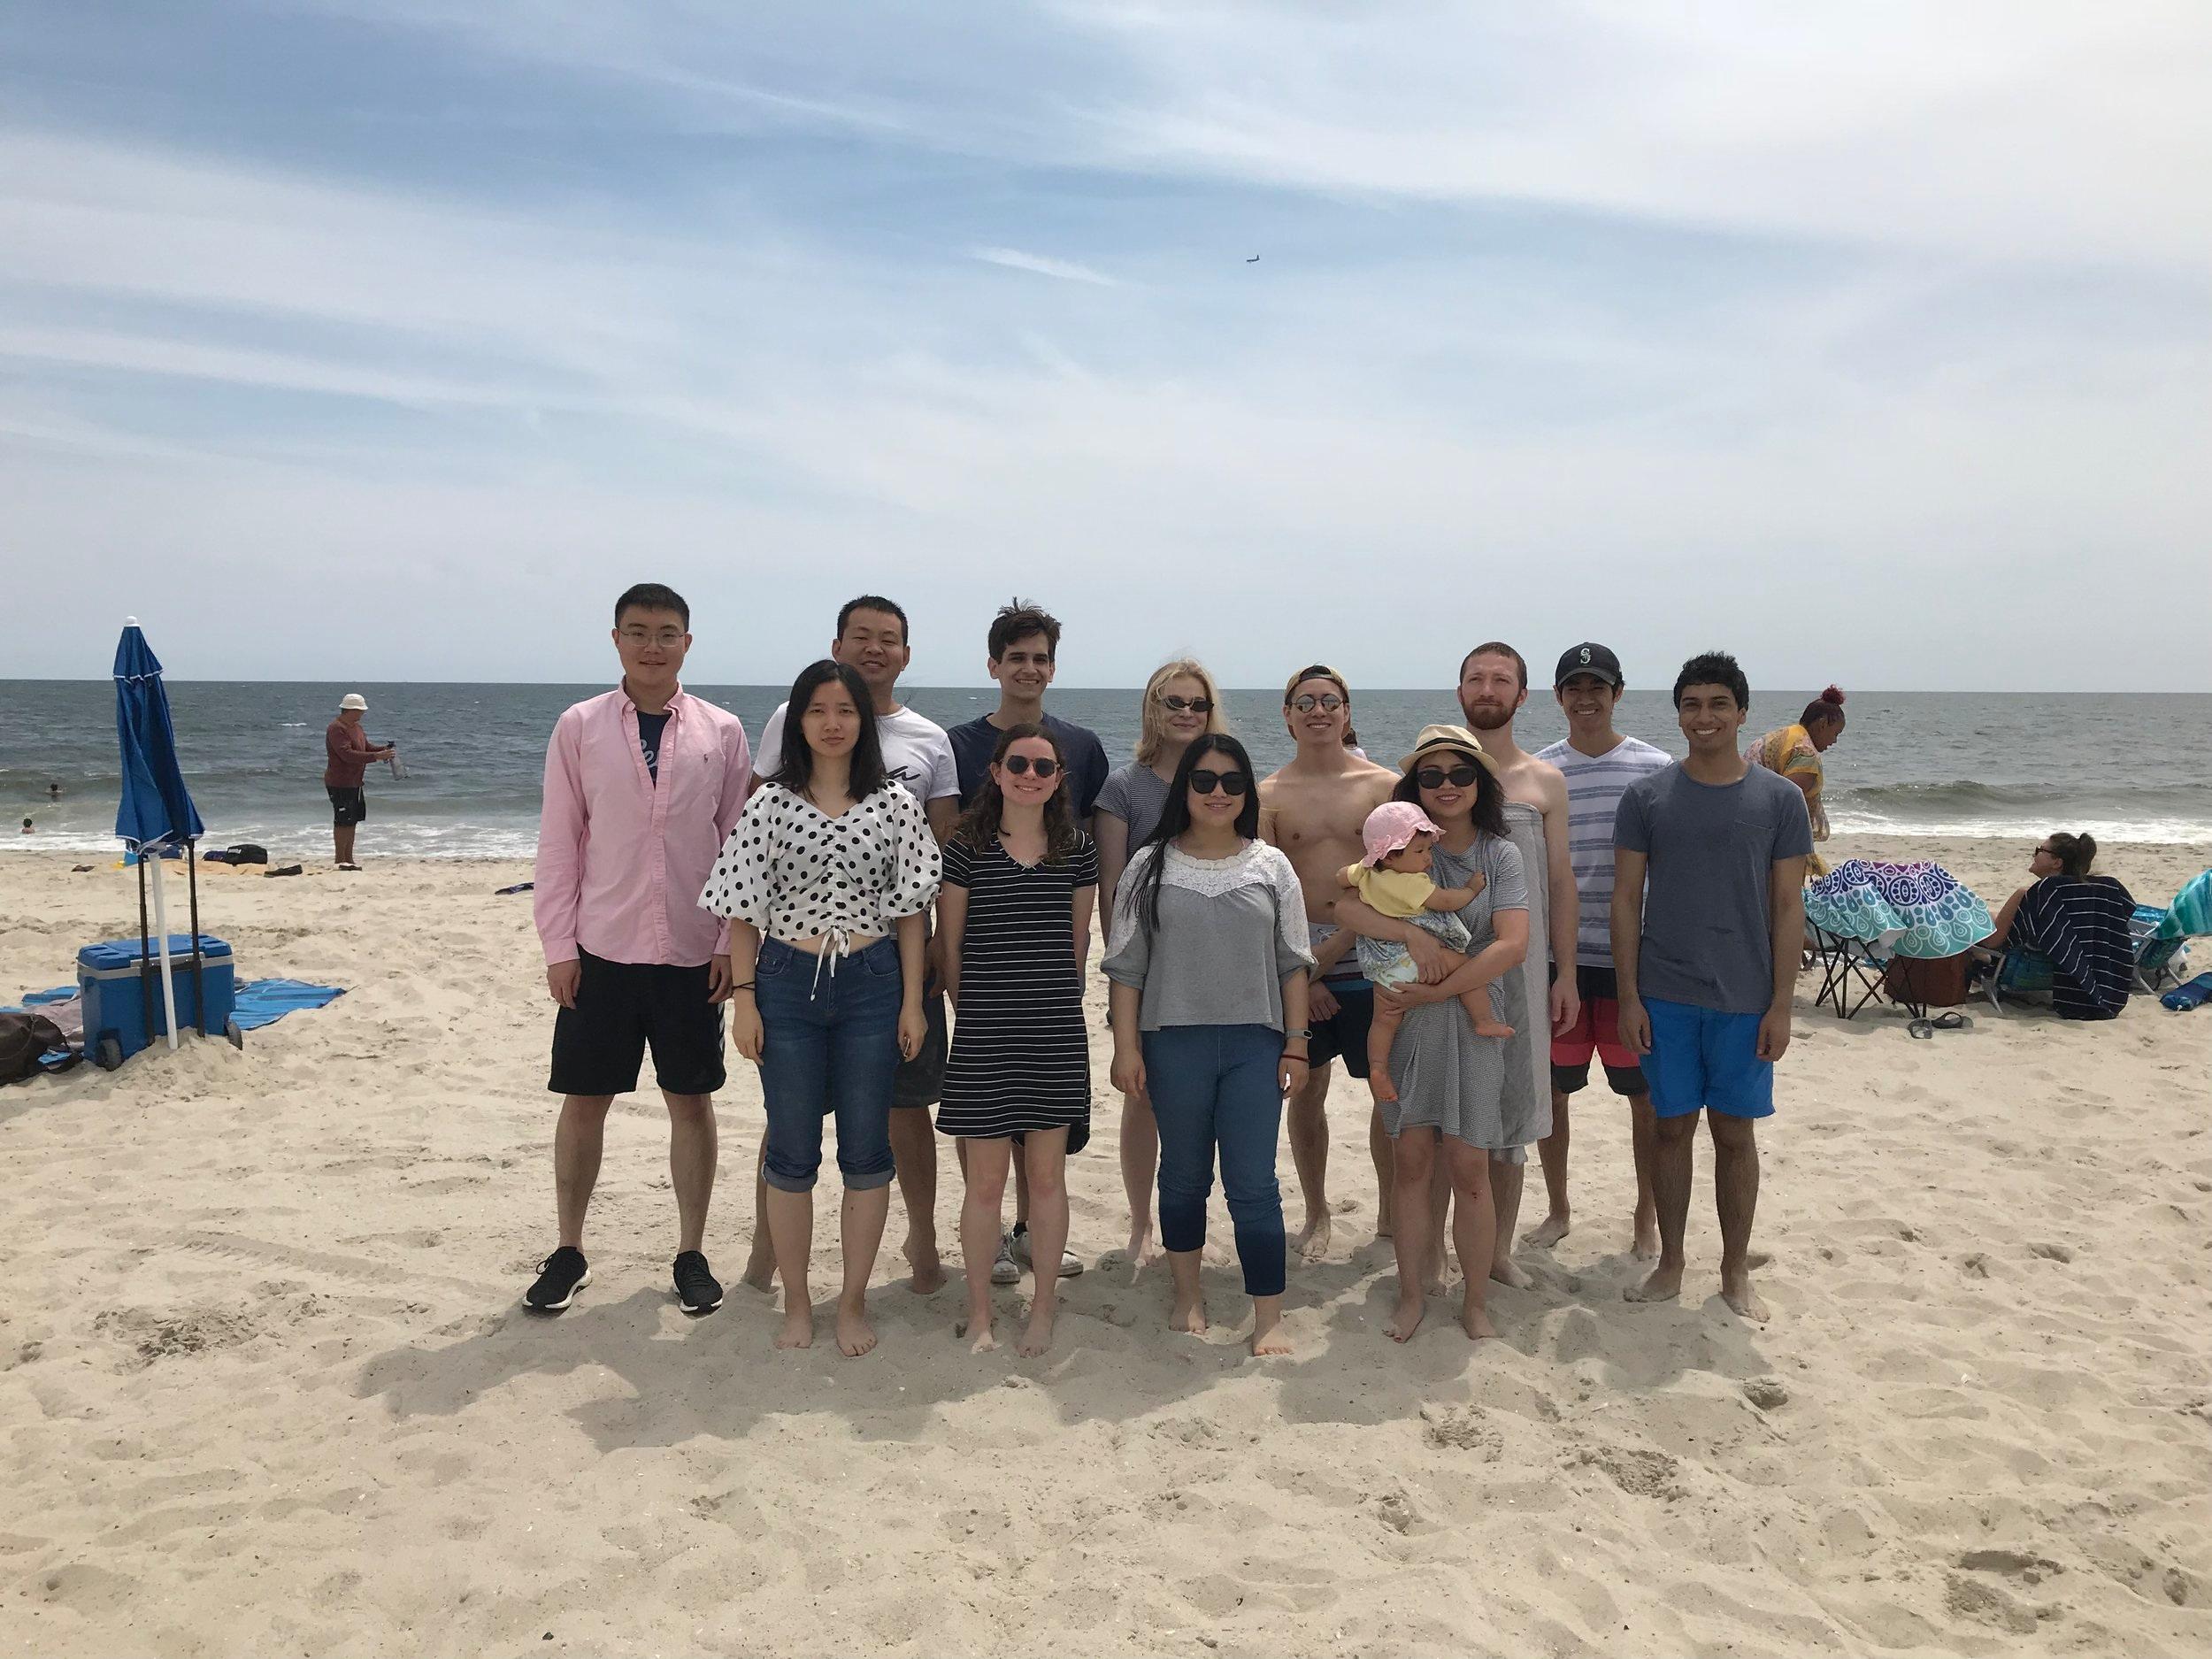 2019 Summer Group Photo at Rockaway Beach!